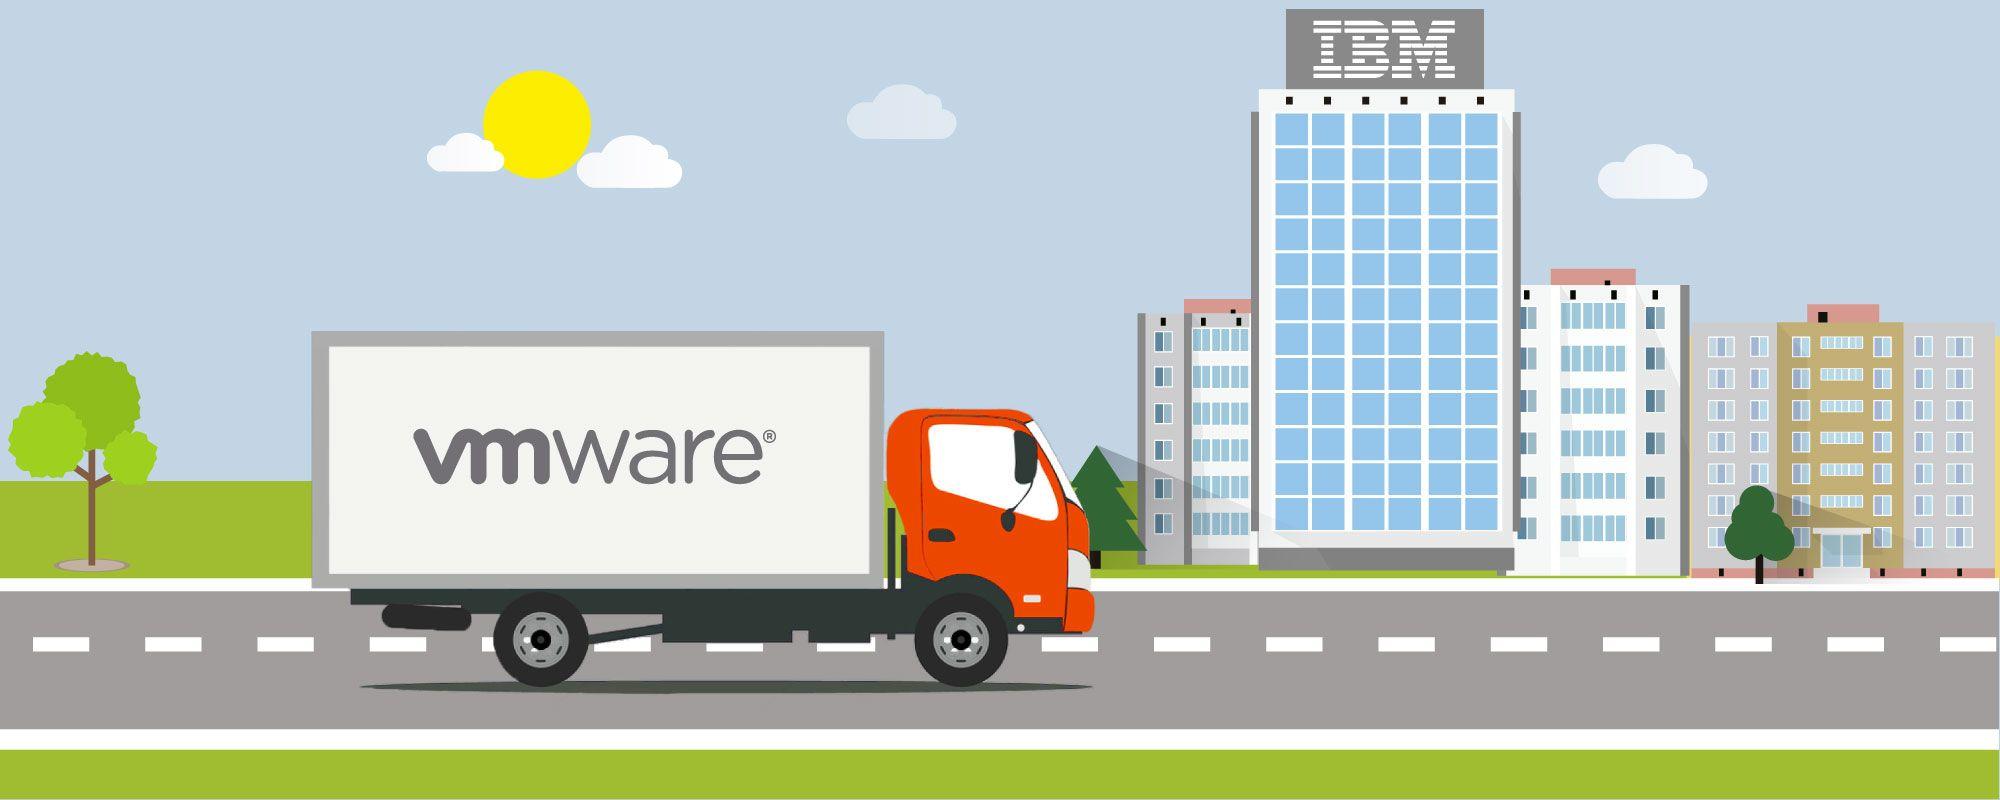 Ibmvmware partnership to ensure seamless workload